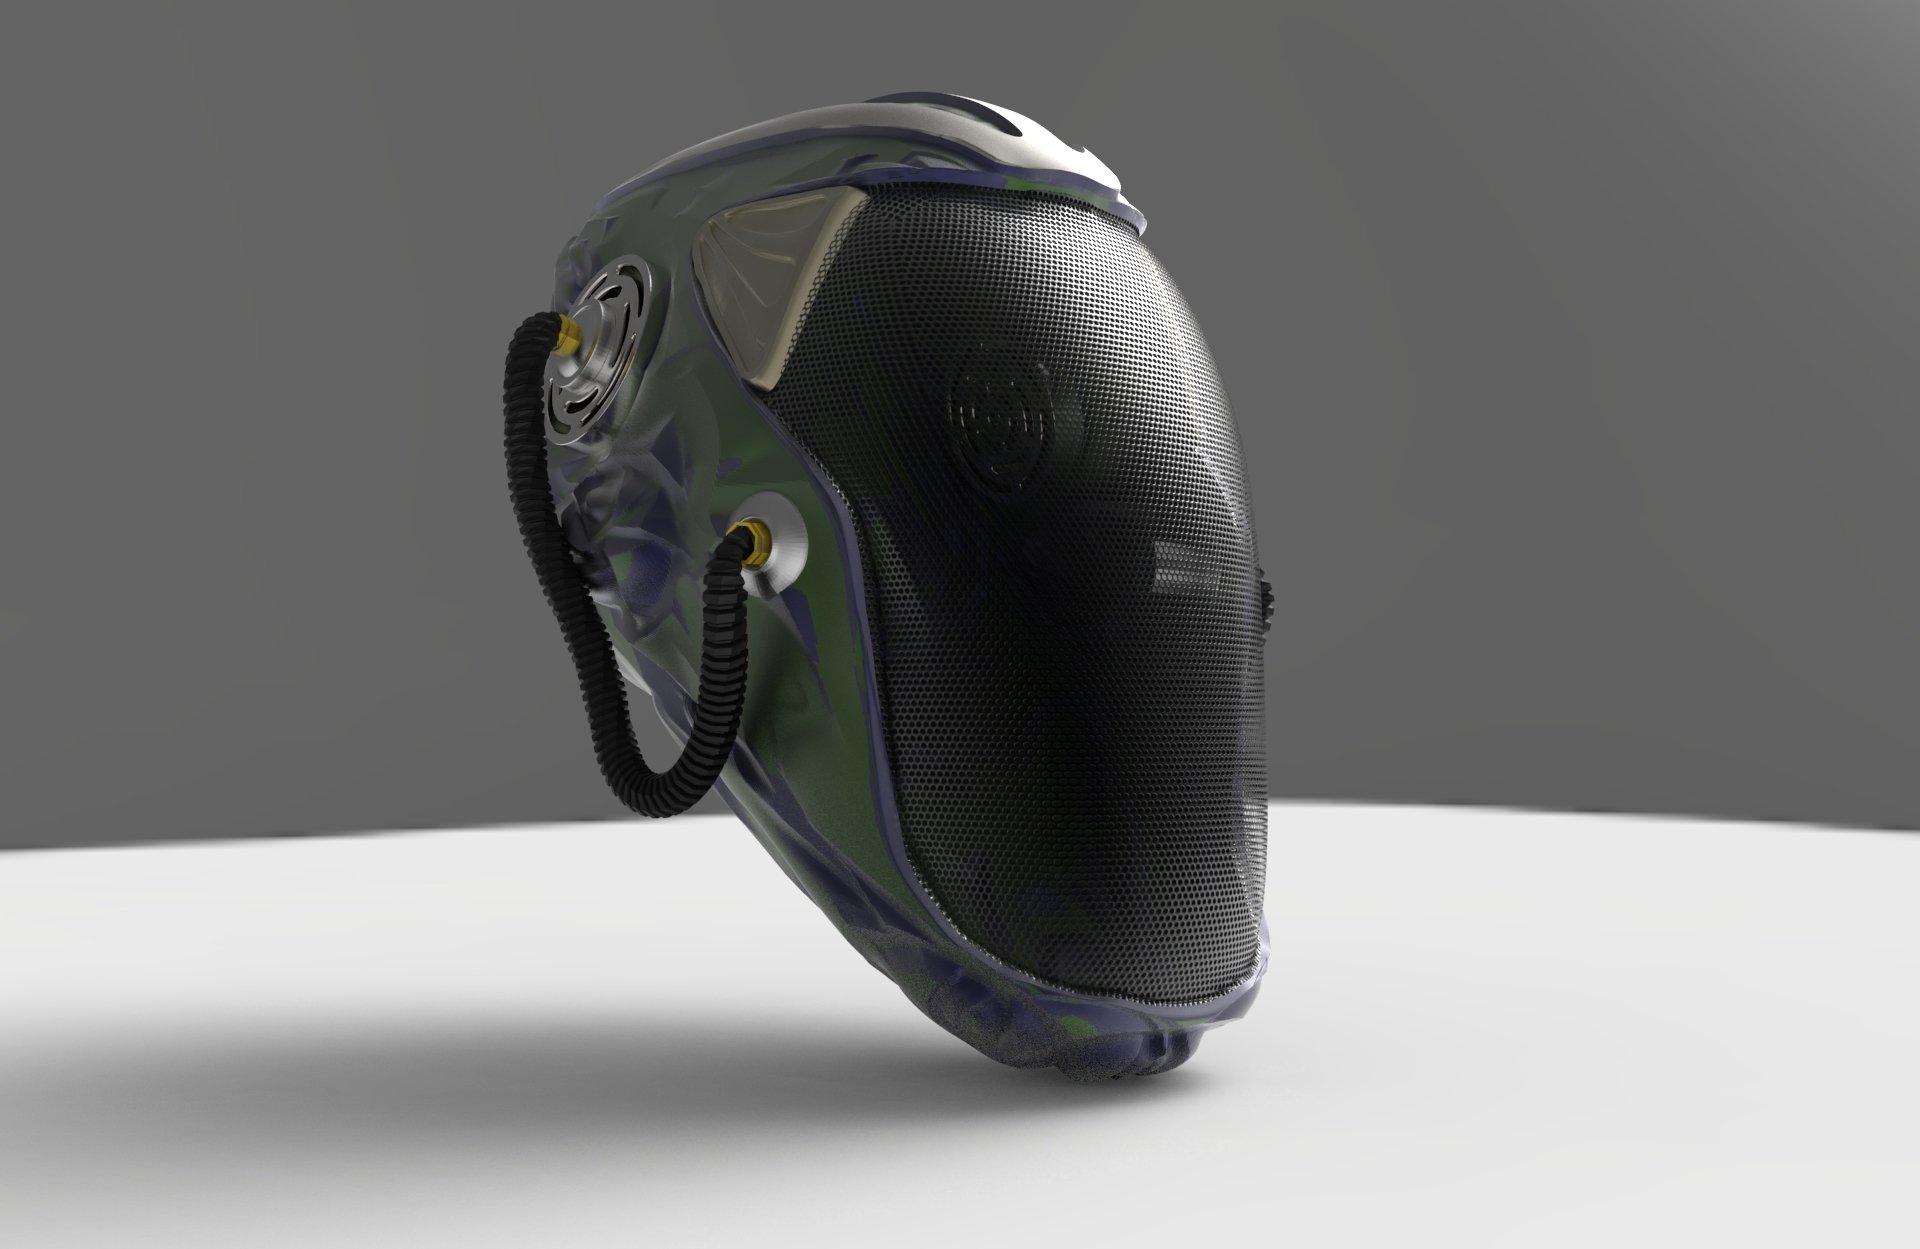 Futuristic Concepts Futuristic Concept Helmet